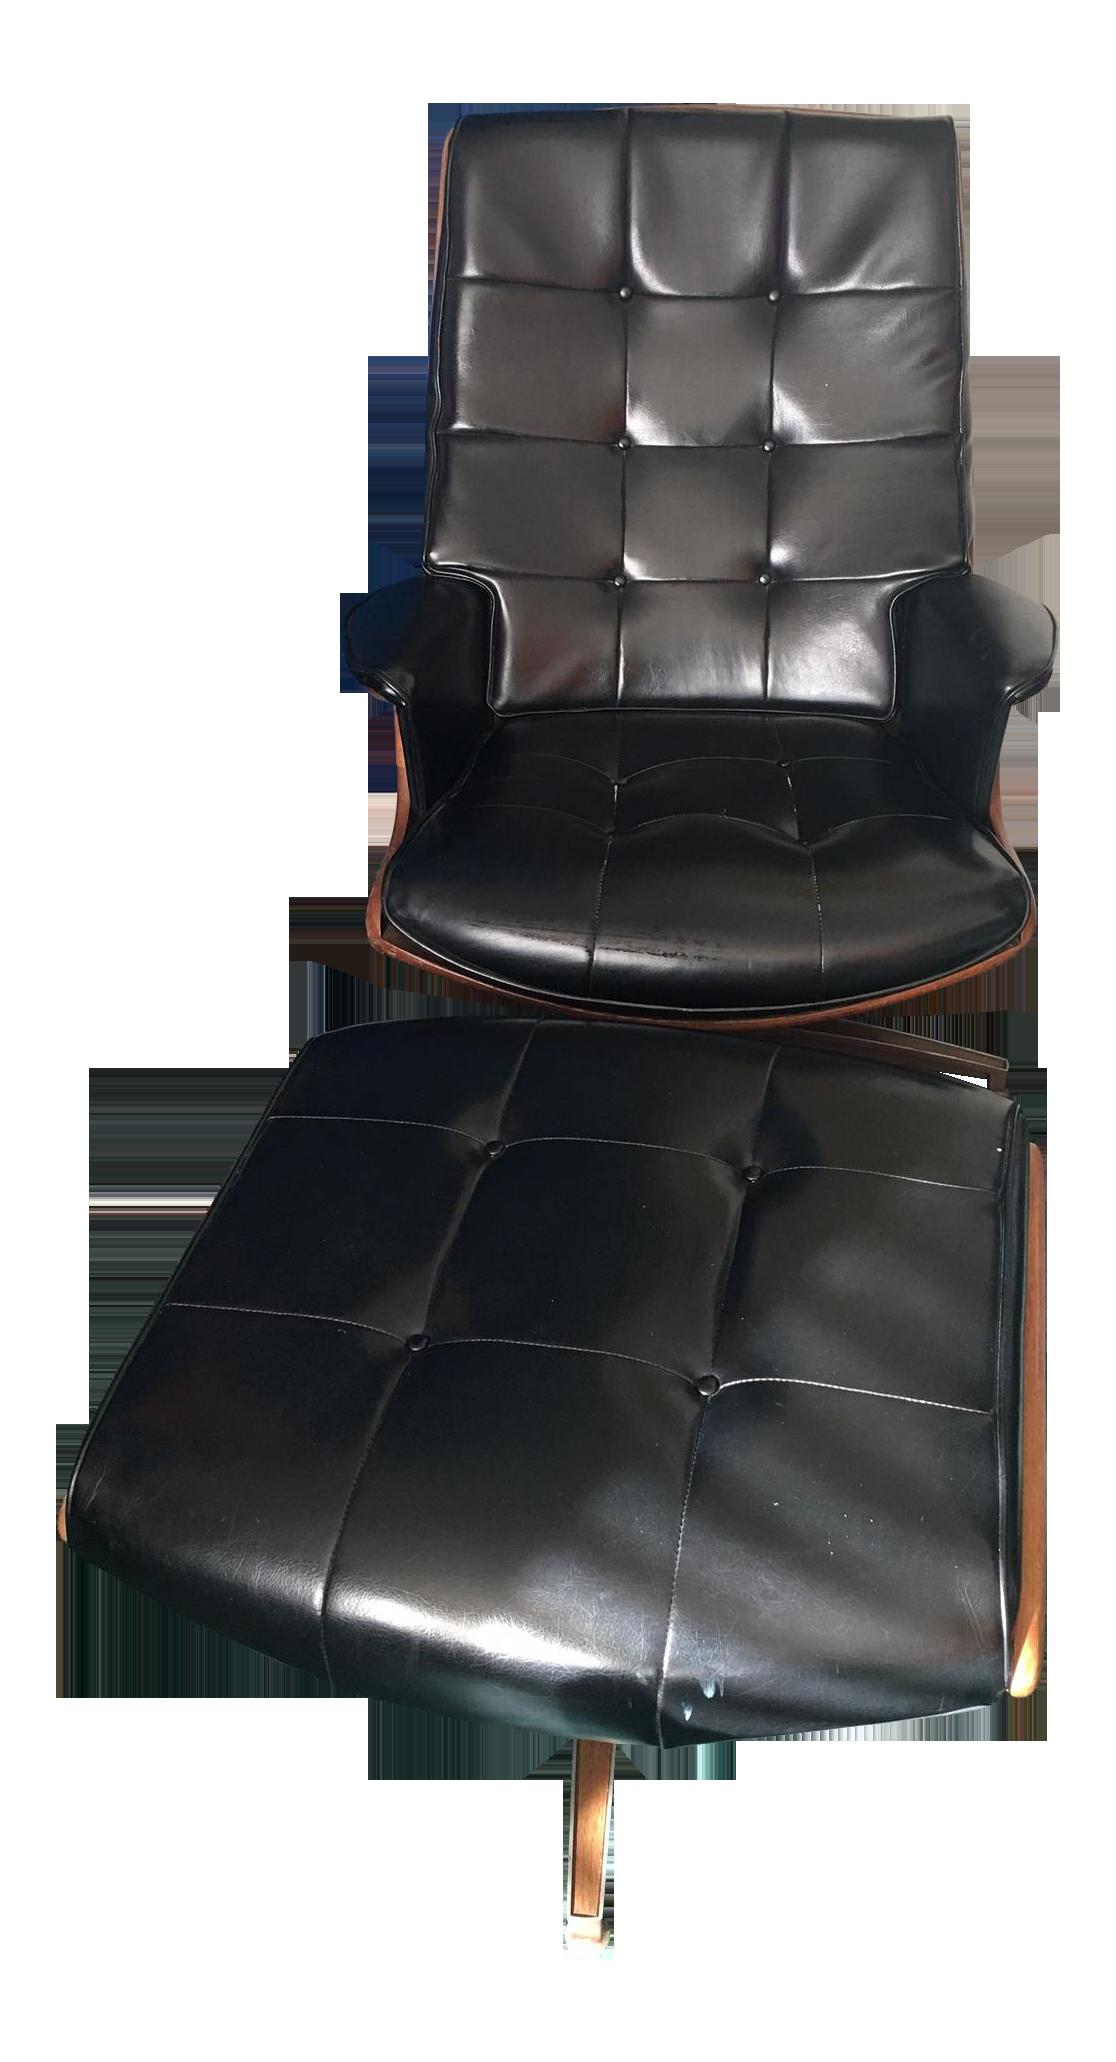 Heywood-Wakefield Lounge Chair and Ottoman  sc 1 st  Chairish & Heywood-Wakefield Lounge Chair and Ottoman   Chairish